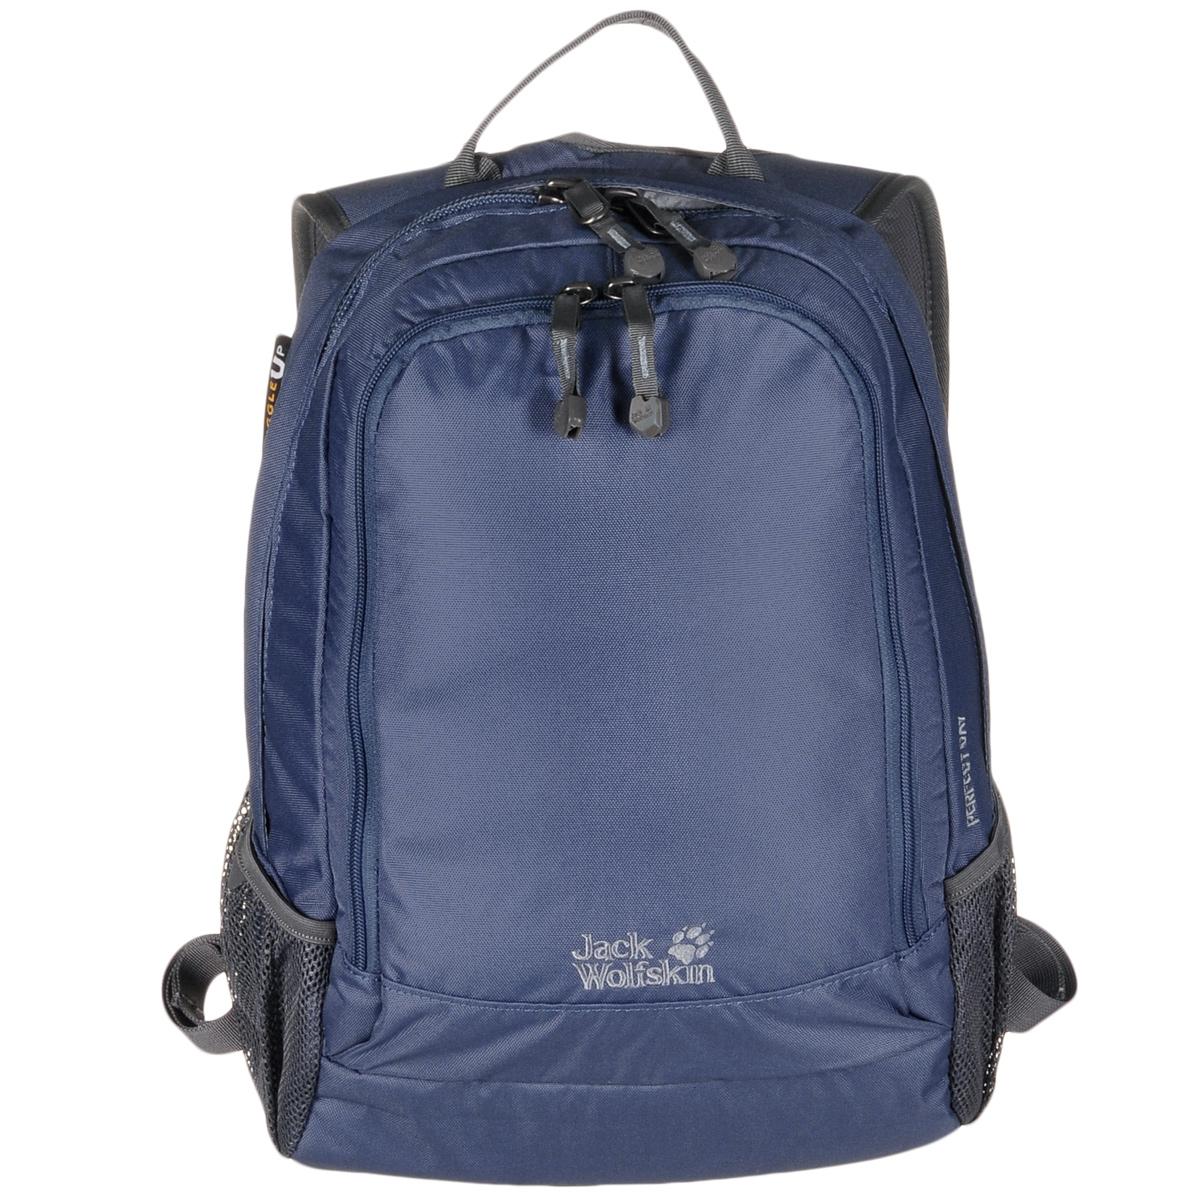 Рюкзак Jack Wolfskin Perfect Day, цвет: индиго, 22 л